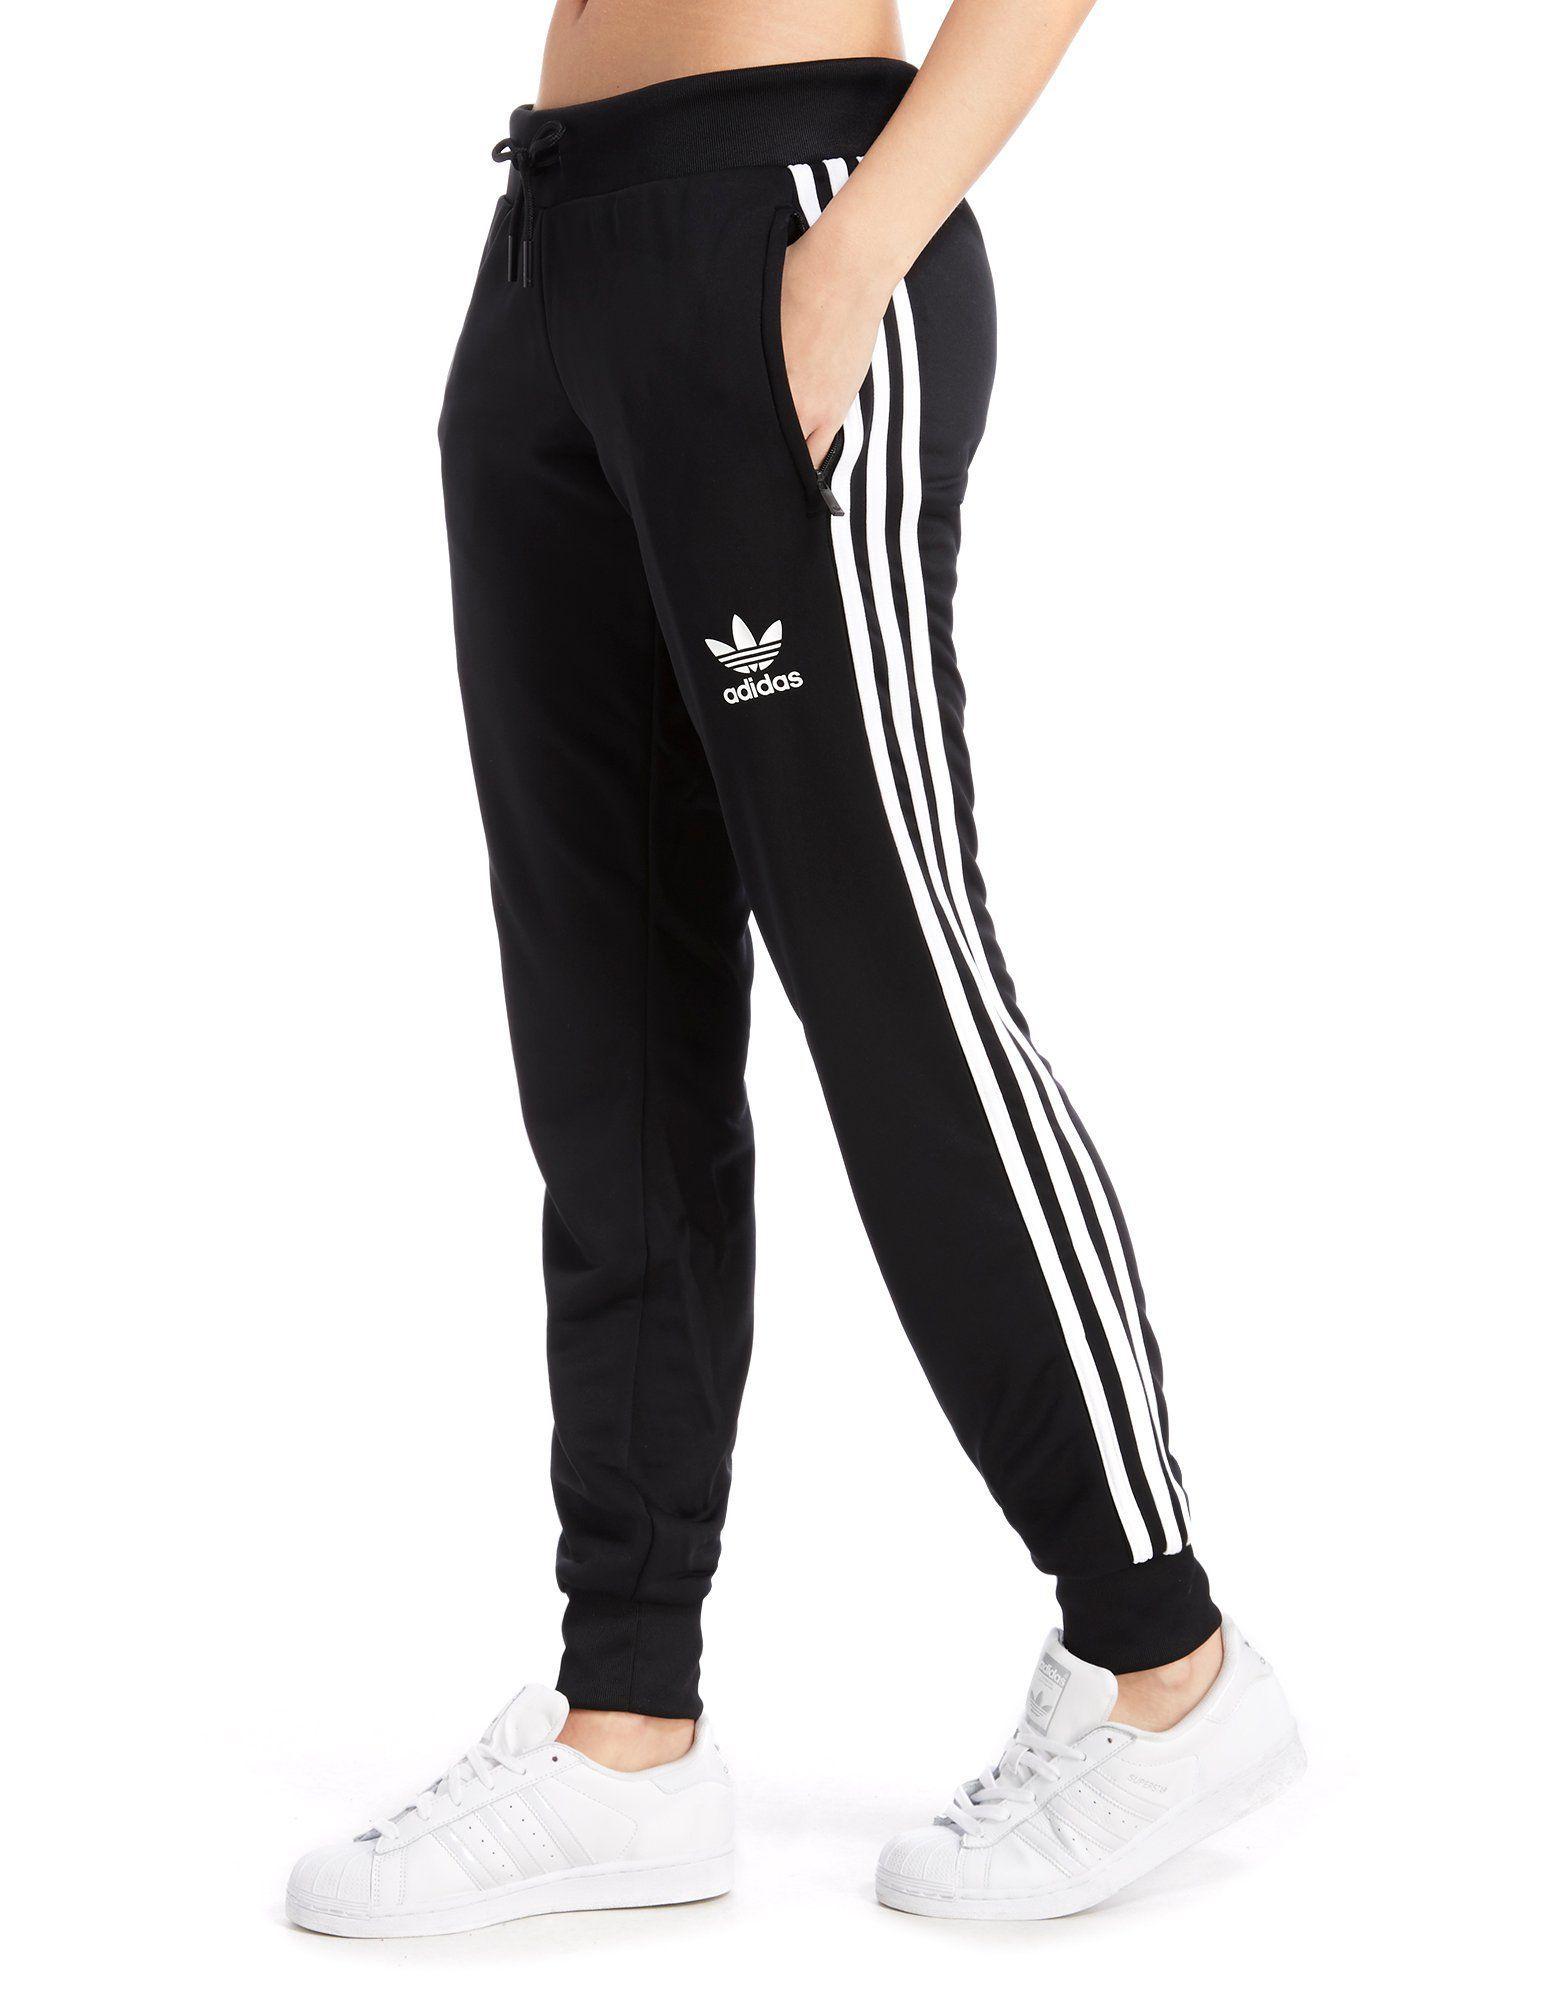 adidas clothing shop online